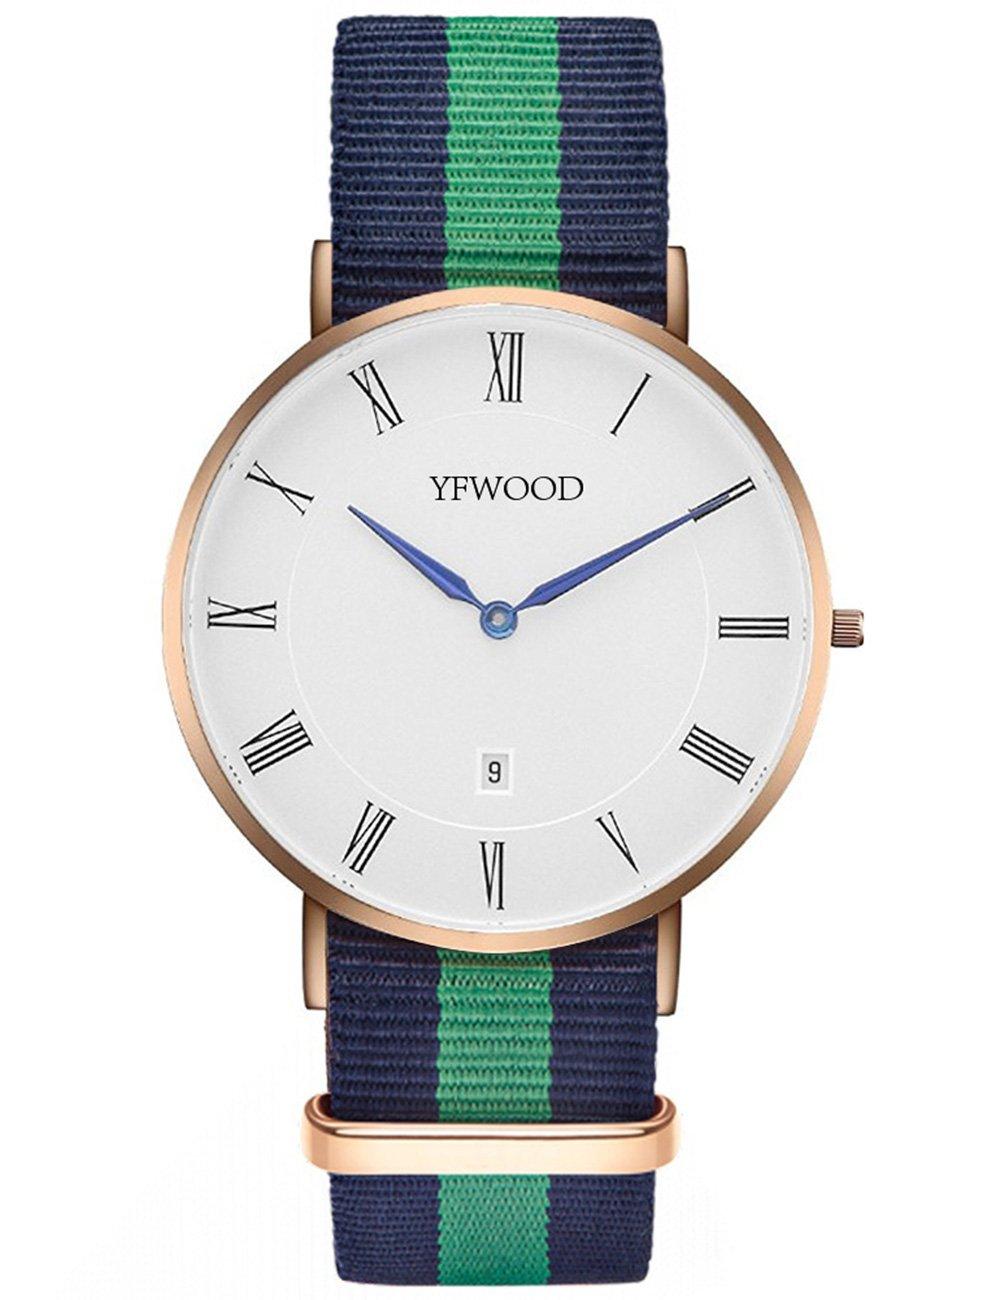 Quartz Watch Nylon Band Unisex Wrist Watch Classic Casual Waterproof Watch Round Dial Business Watch